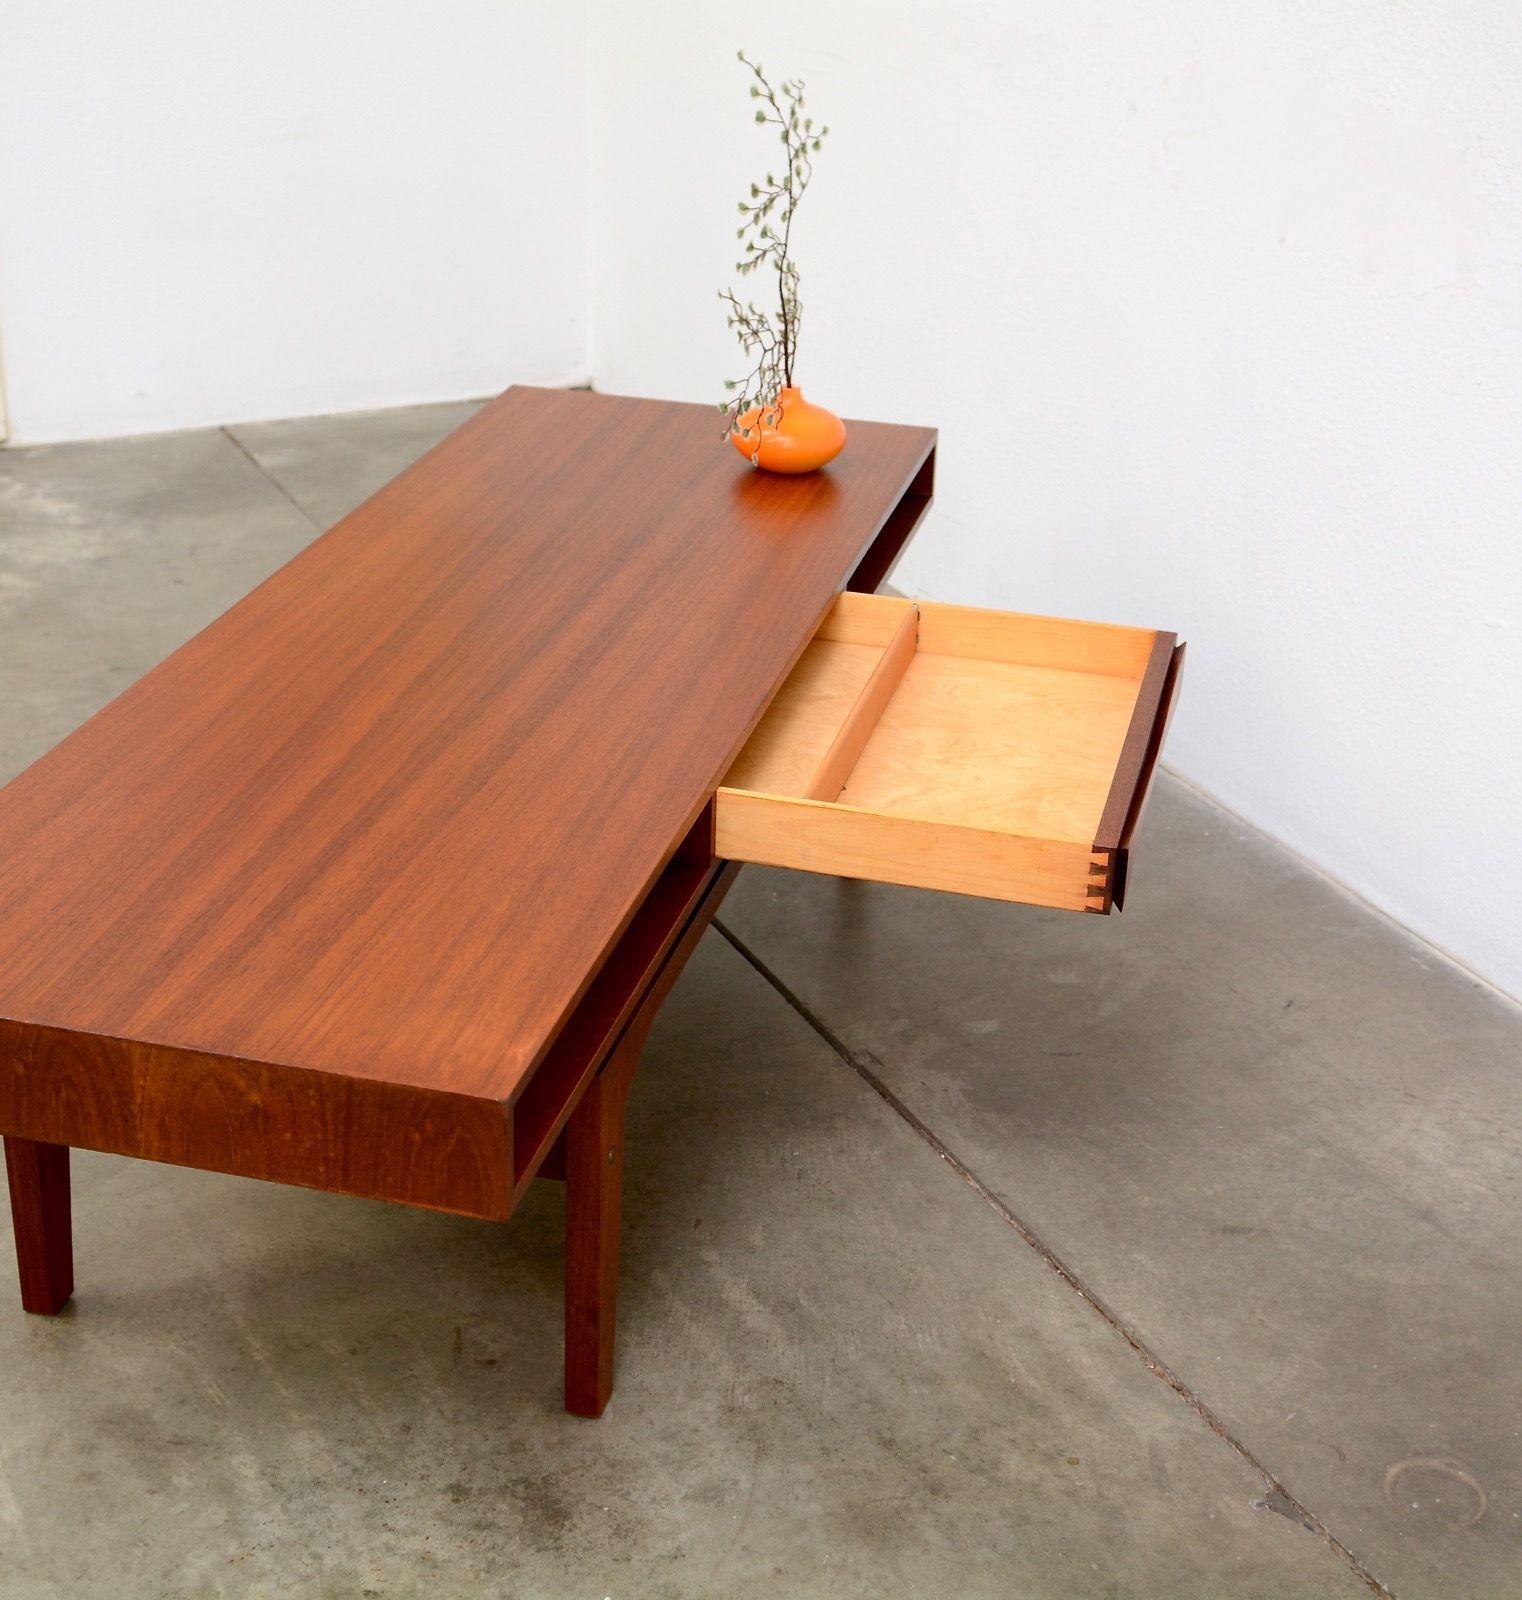 1960s Danish Modern Ew Bach Teak Coffee Table Mid Century Vintage Eames Mid Century Coffee Table Teak Coffee Table Coffee Table [ 1600 x 1522 Pixel ]